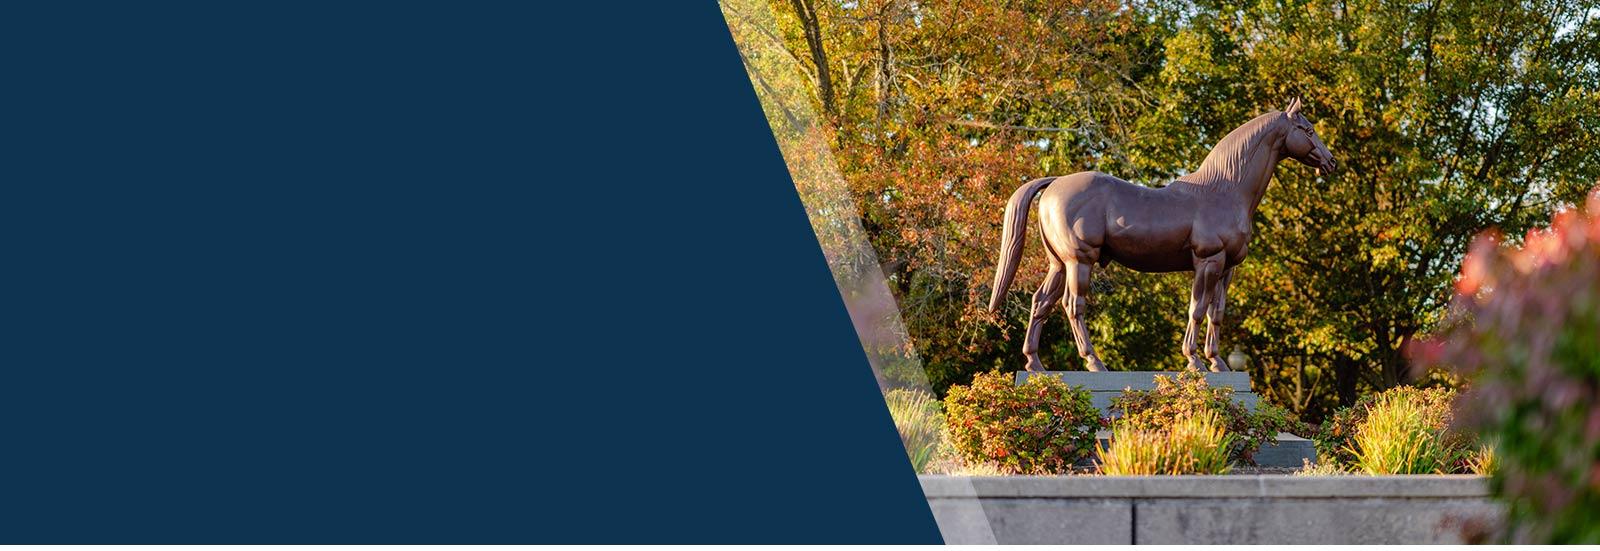 Fall at the Kentucky Horse Park